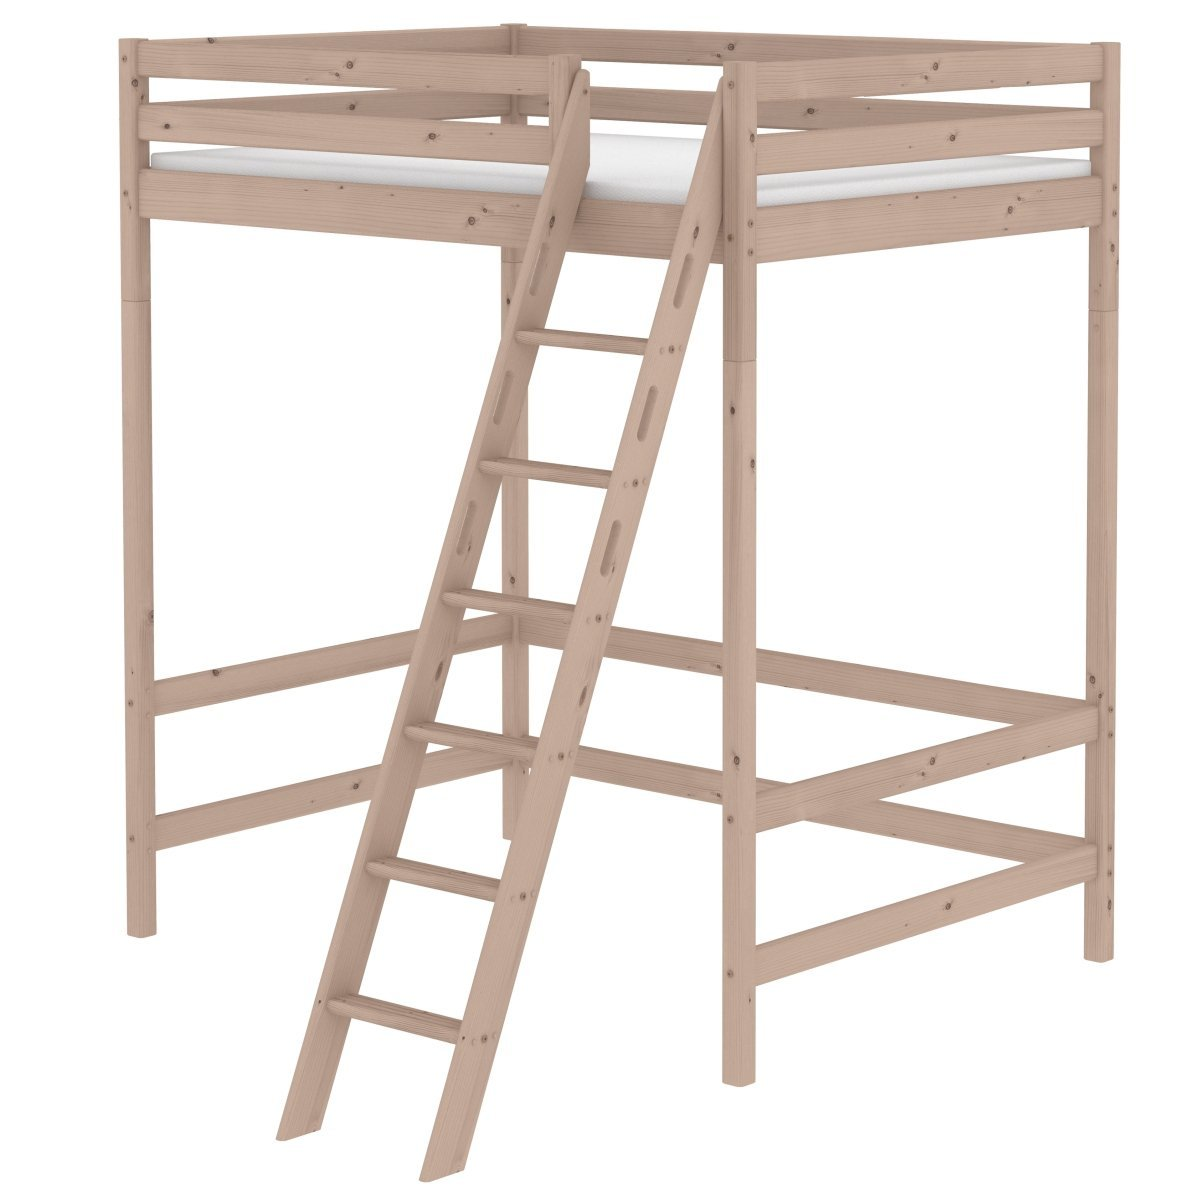 flexa classic hochb mezzanine terra 90 10746 11 01 789. Black Bedroom Furniture Sets. Home Design Ideas